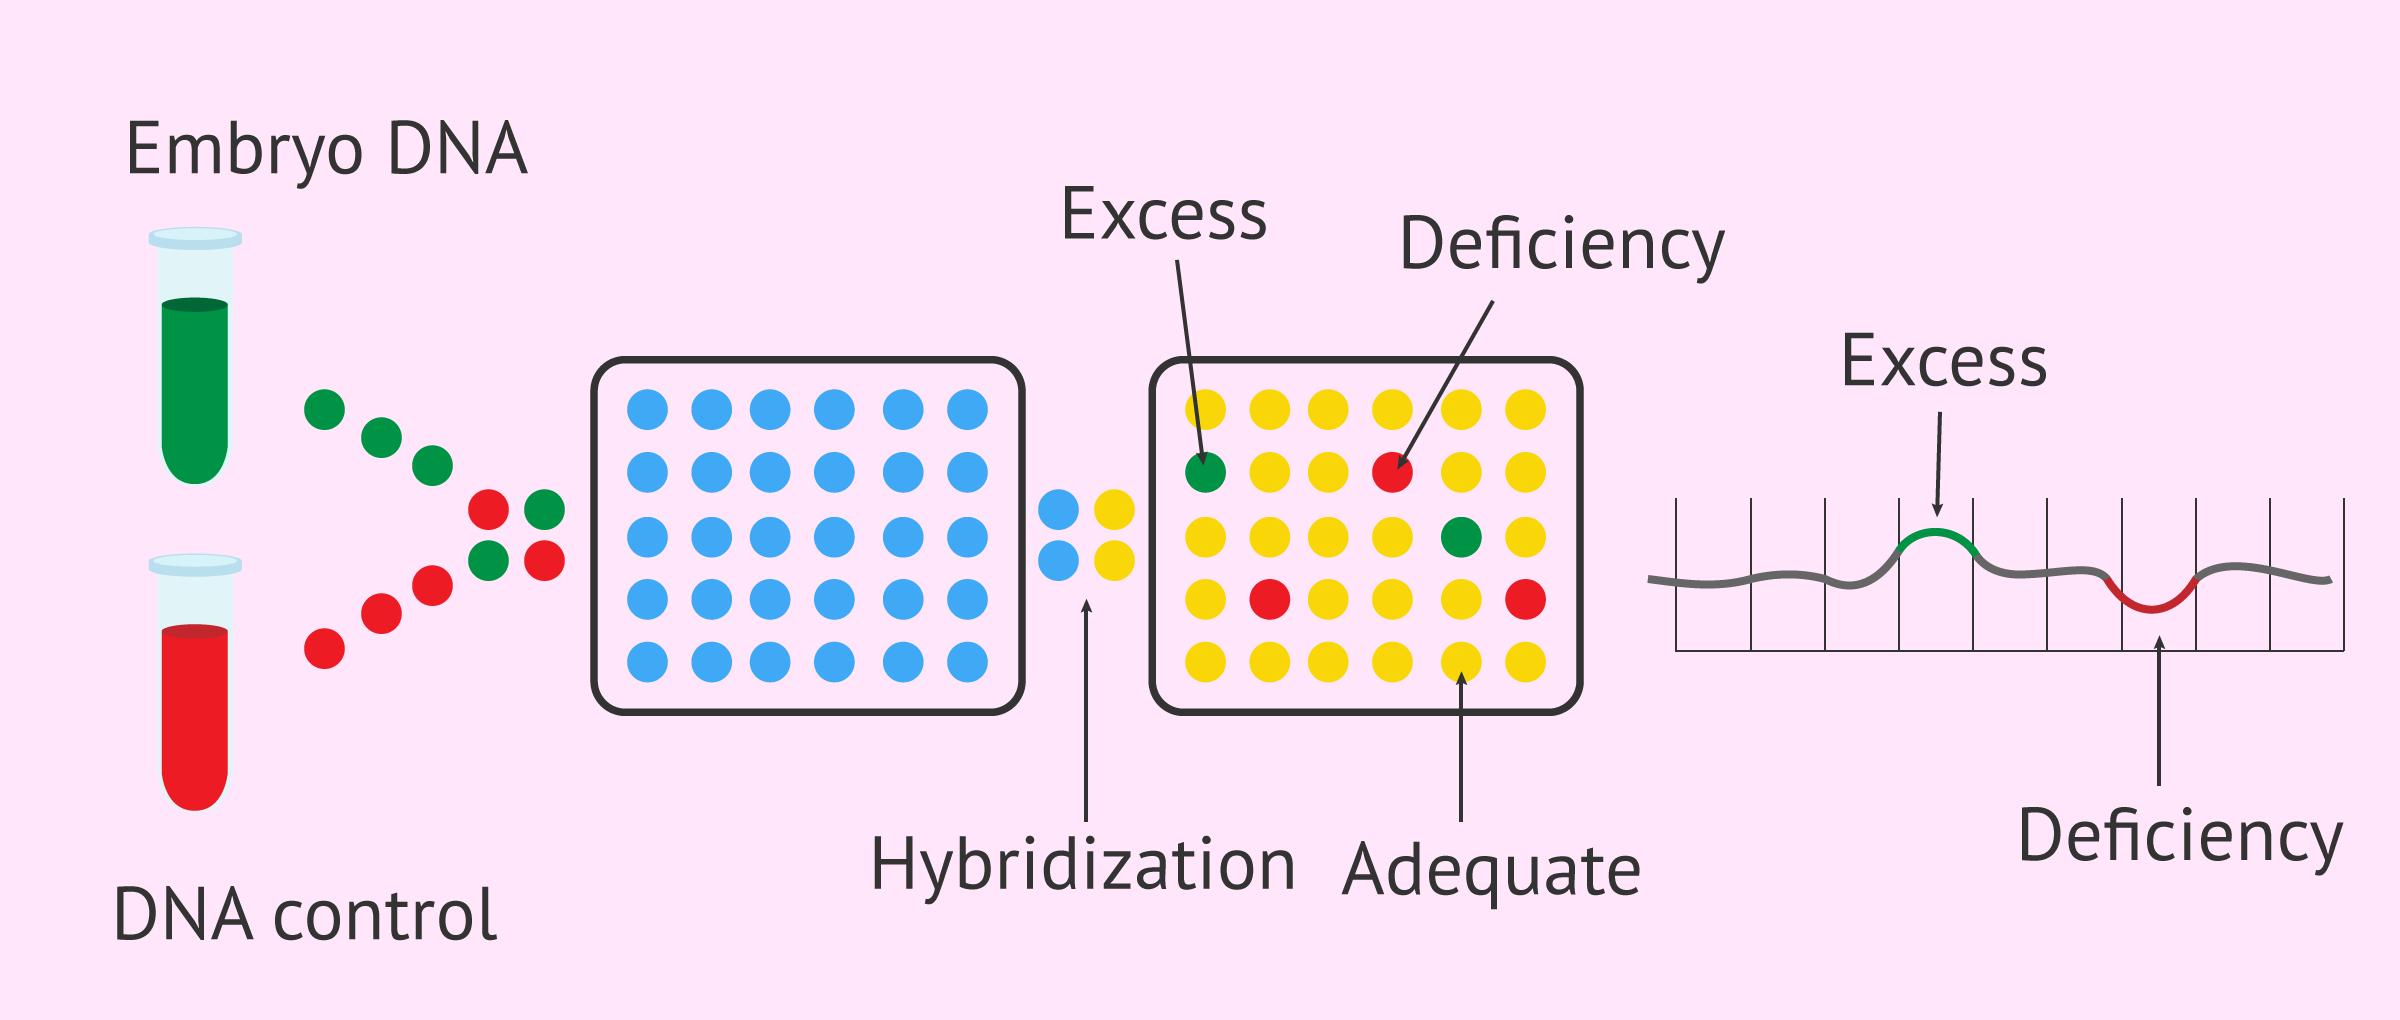 Genetic analysis by CGH arrays